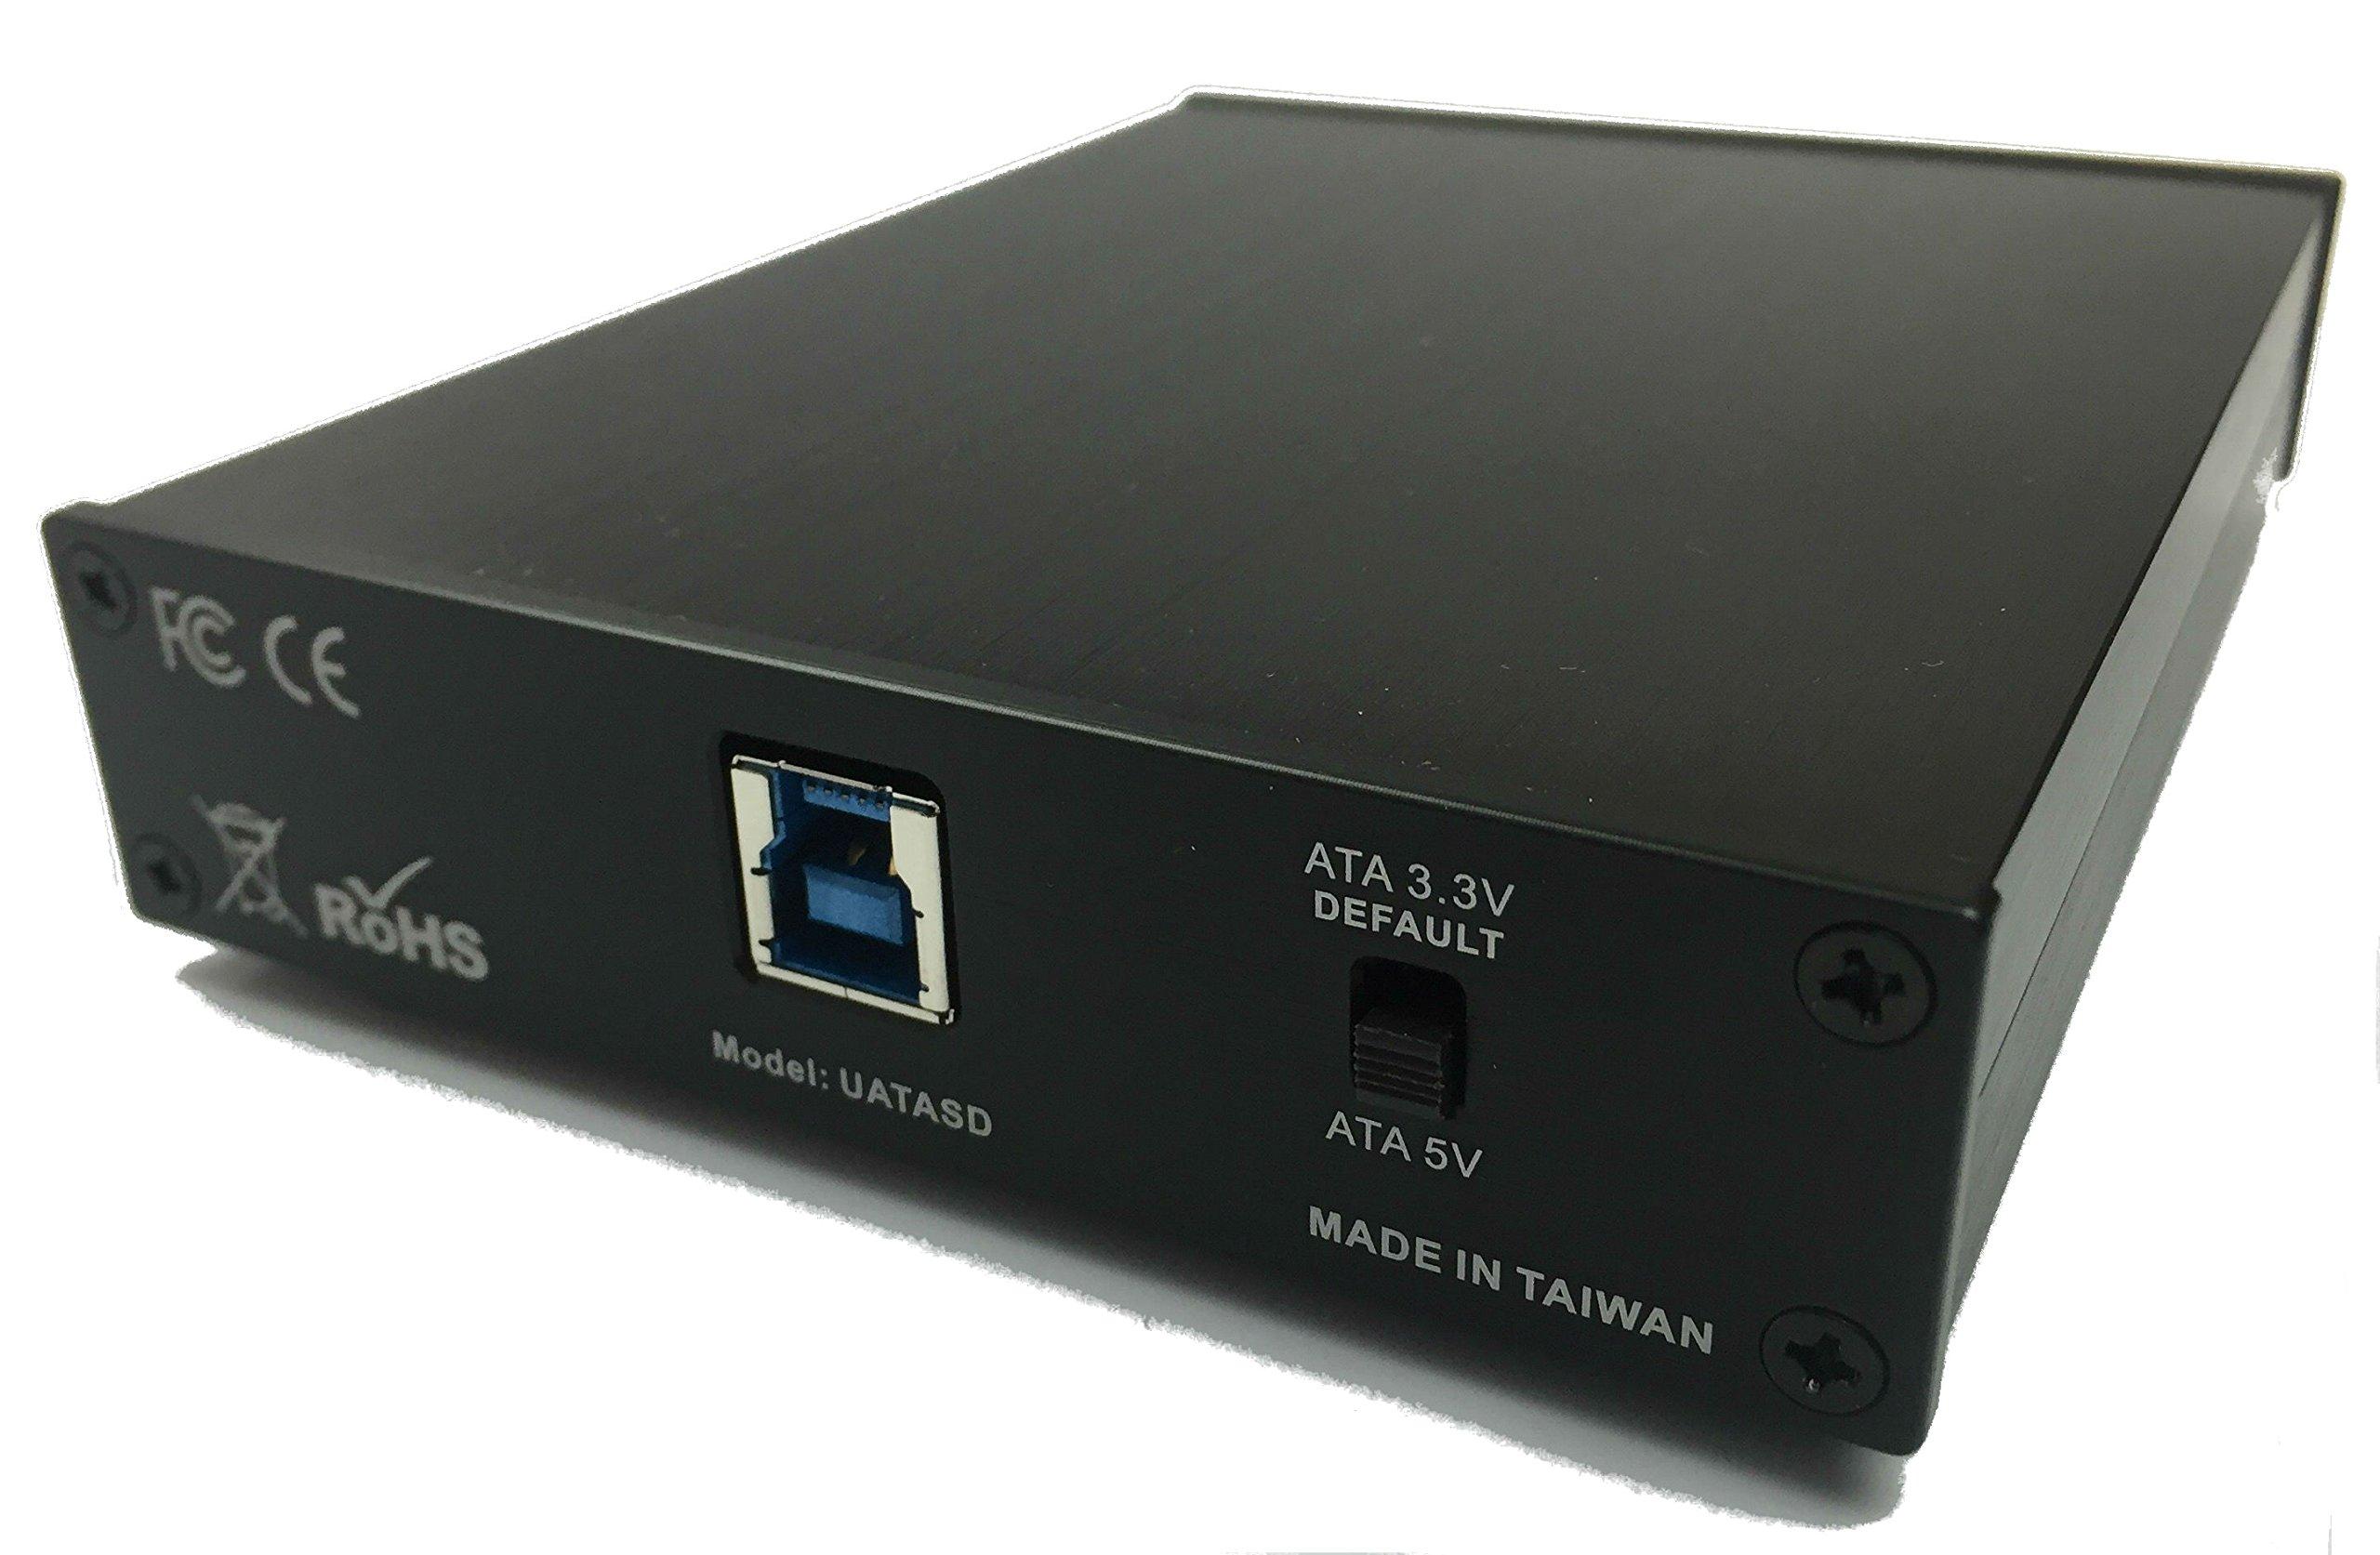 DIGIGEAR ATA Flash PCMCIA PC Card & SD/SDHC/SDXC USB 3.0 Industrial Grade Reader by Digigear (Image #2)